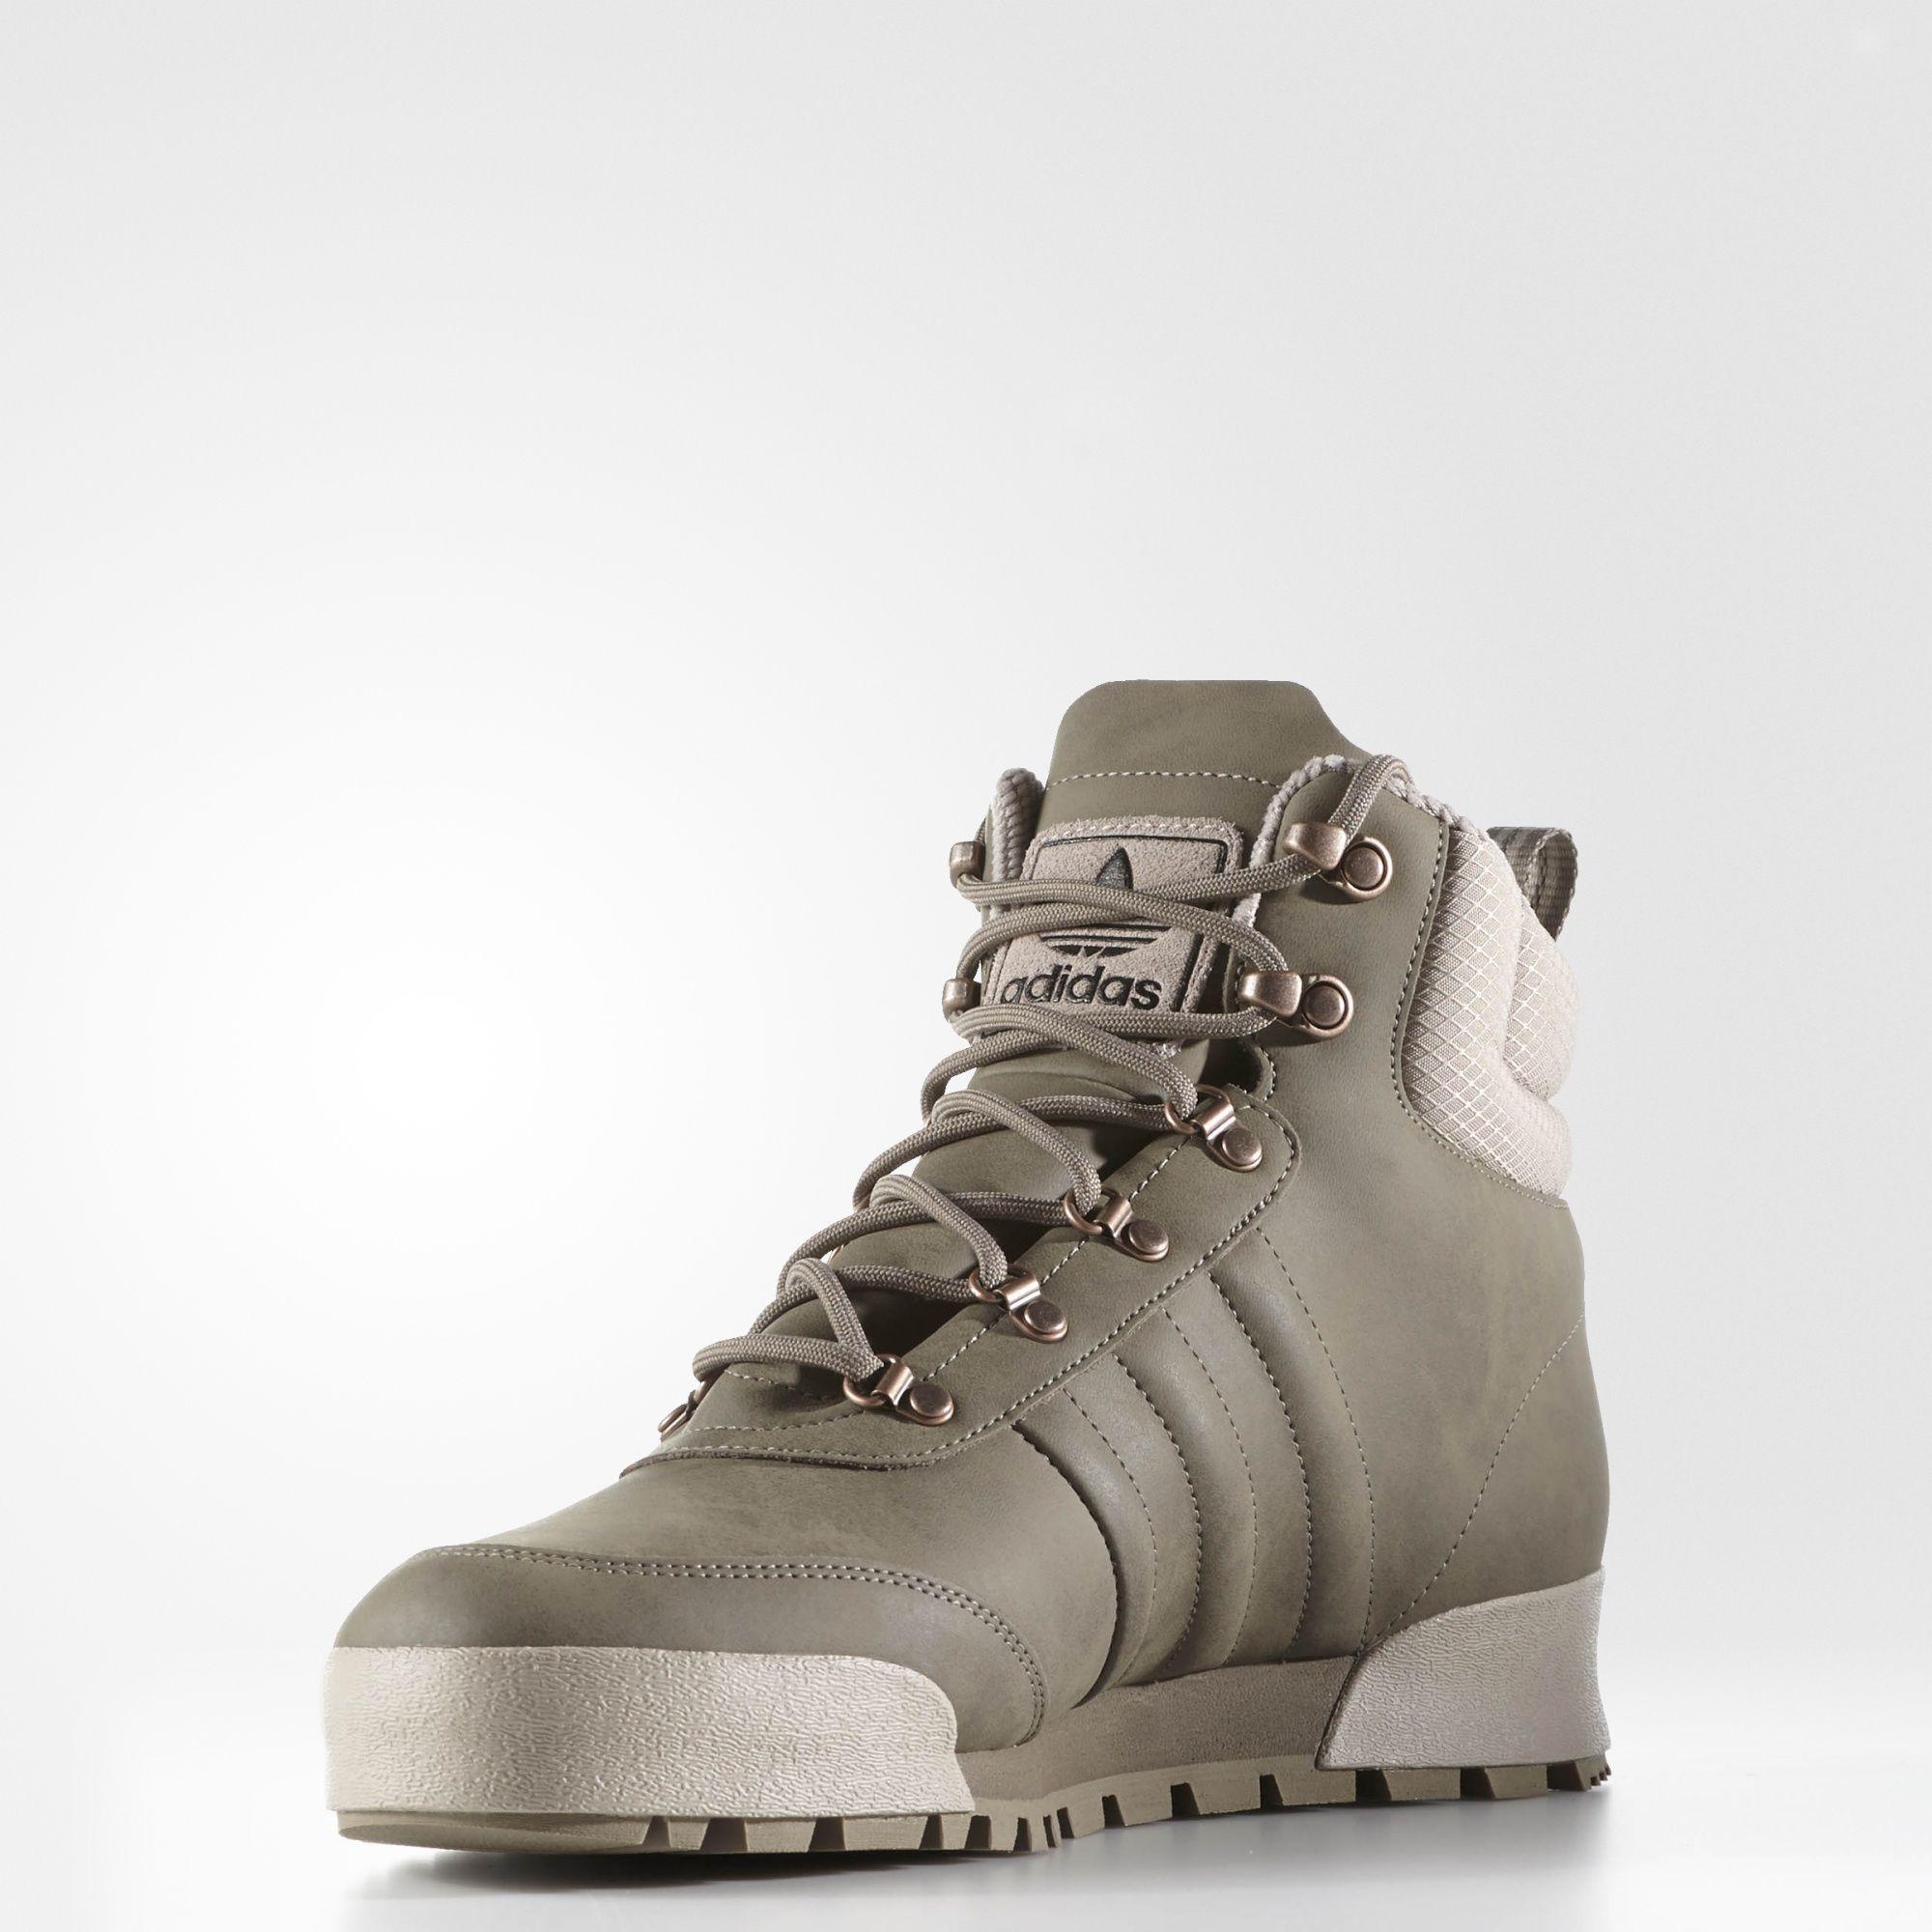 adidas - Jake 2.0 Boots | Sneakers men fashion, Mens boots fashion ...